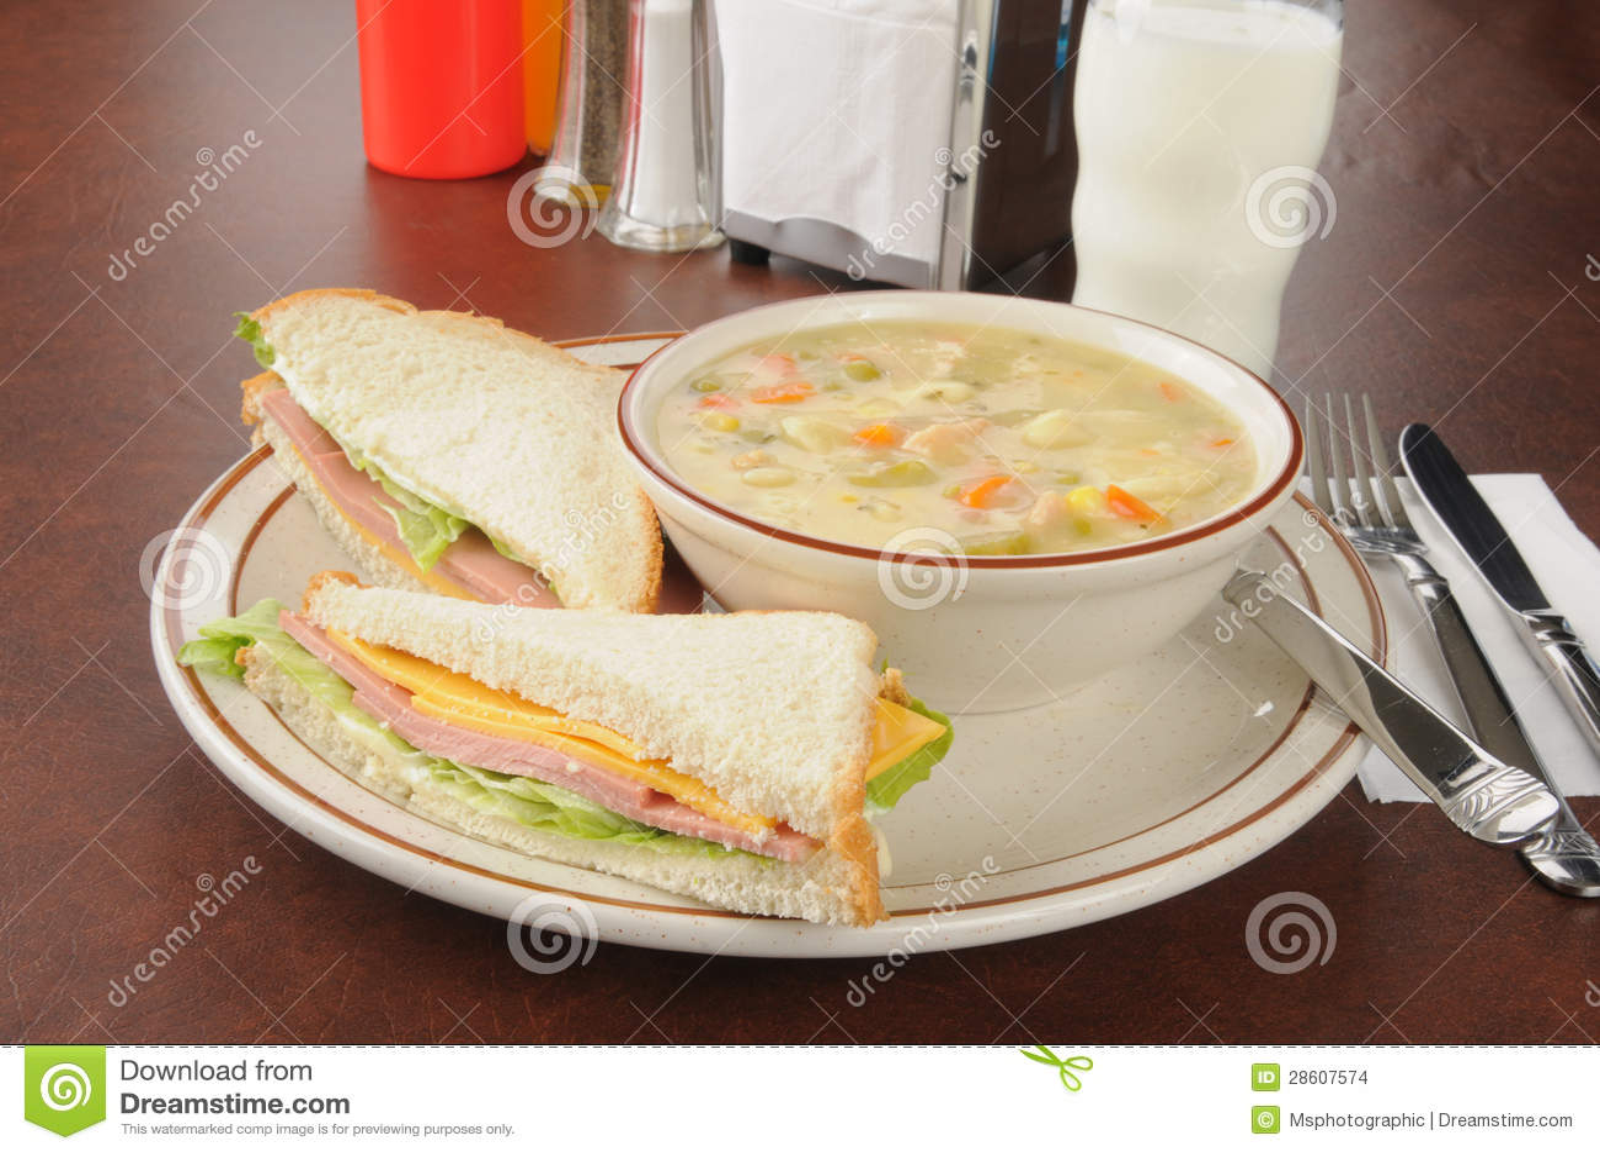 rilievi fonometrici bologna sandwich - photo#24